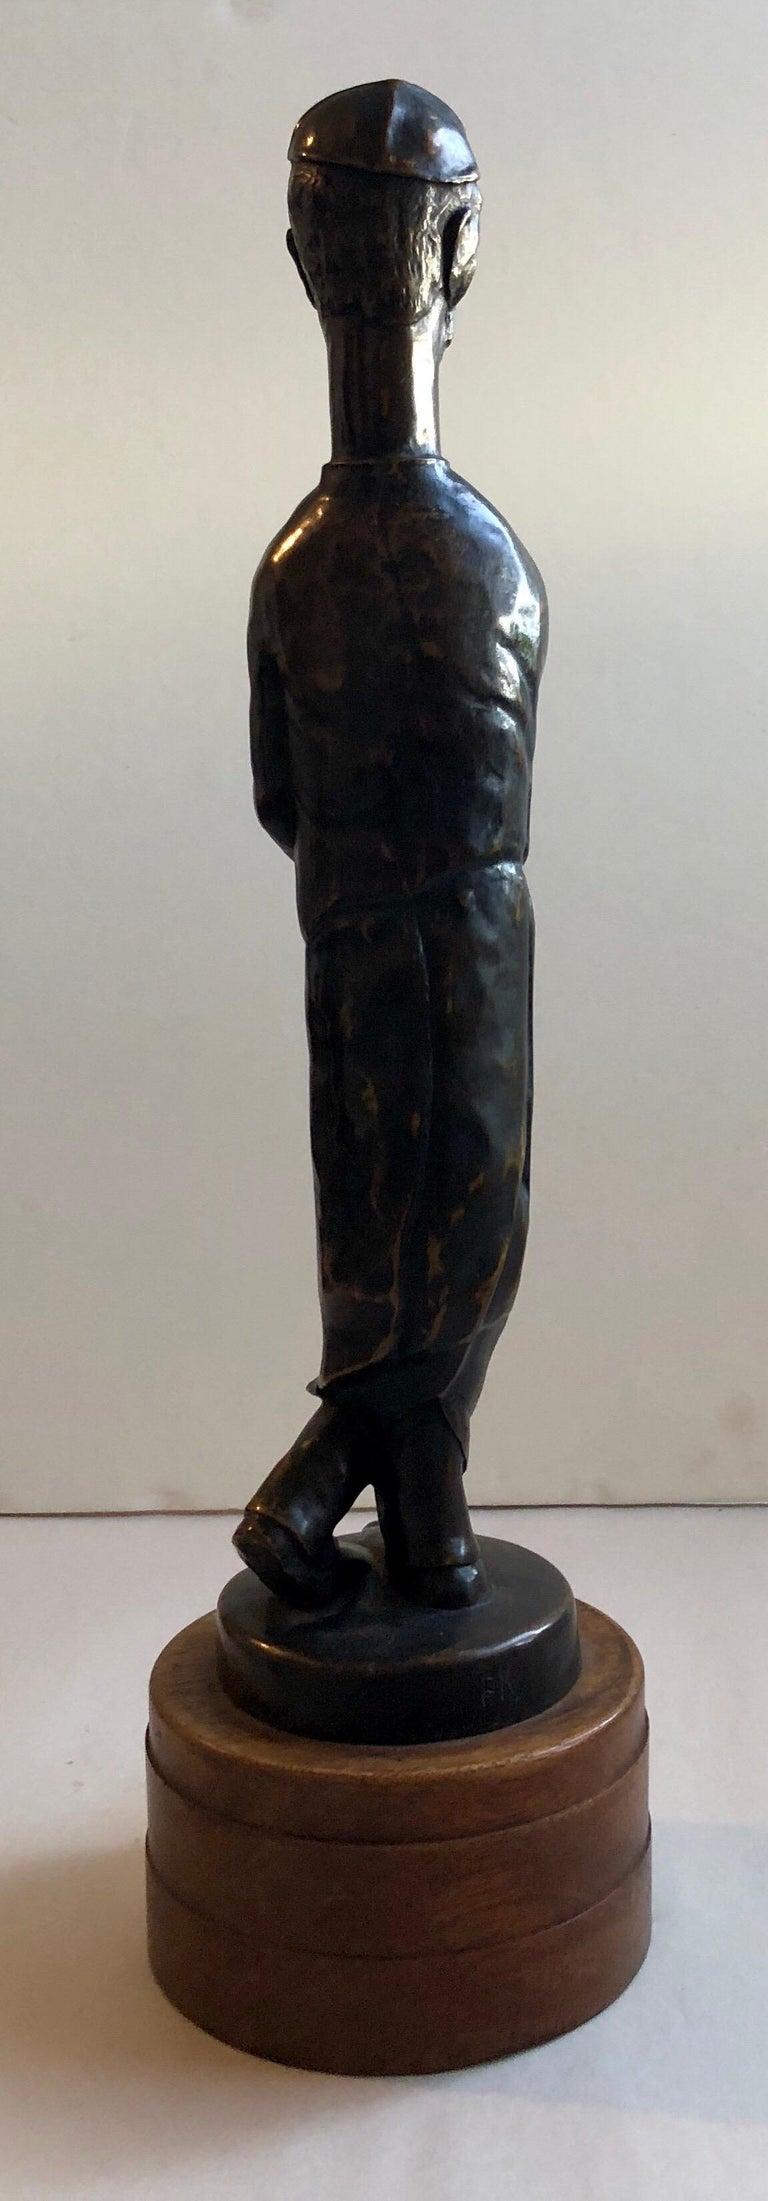 Art Deco Expressionist Bronze Judaica Rabbi Sculpture Los Angeles Modernist For Sale 9